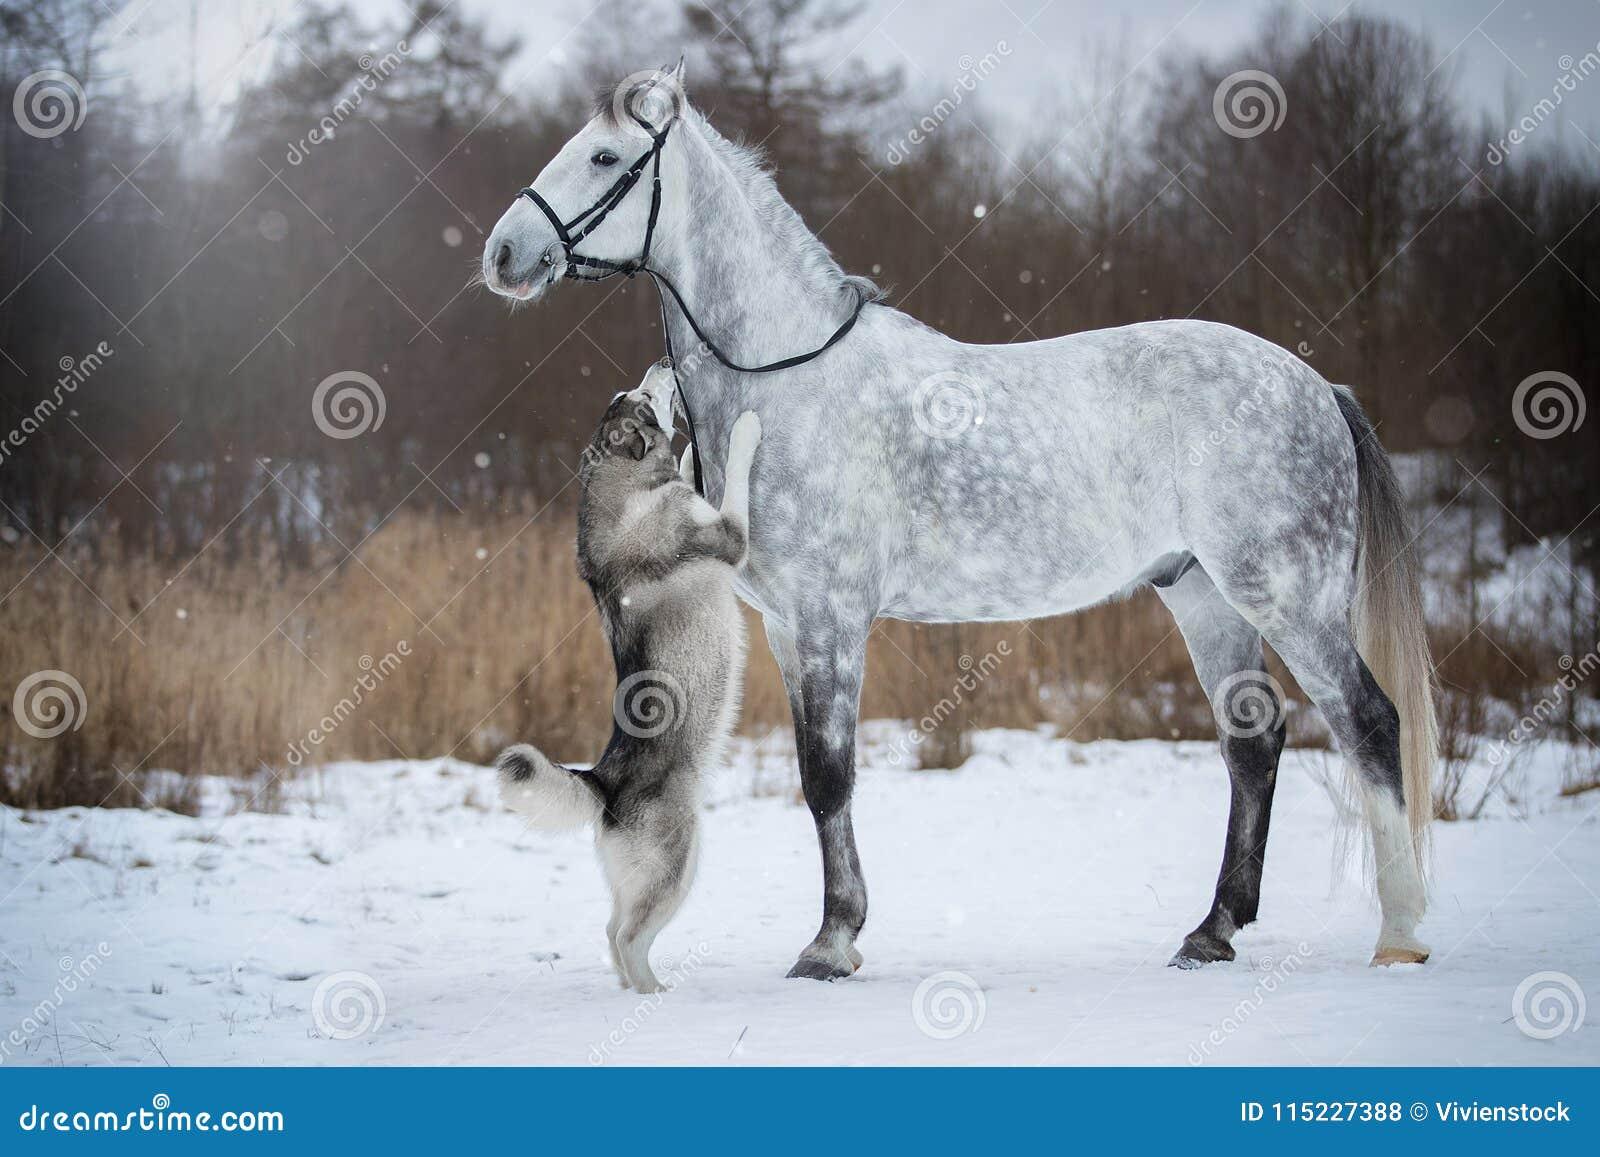 Koń prowadzi psa uzdą Orlovskiy kłusak i Alaski